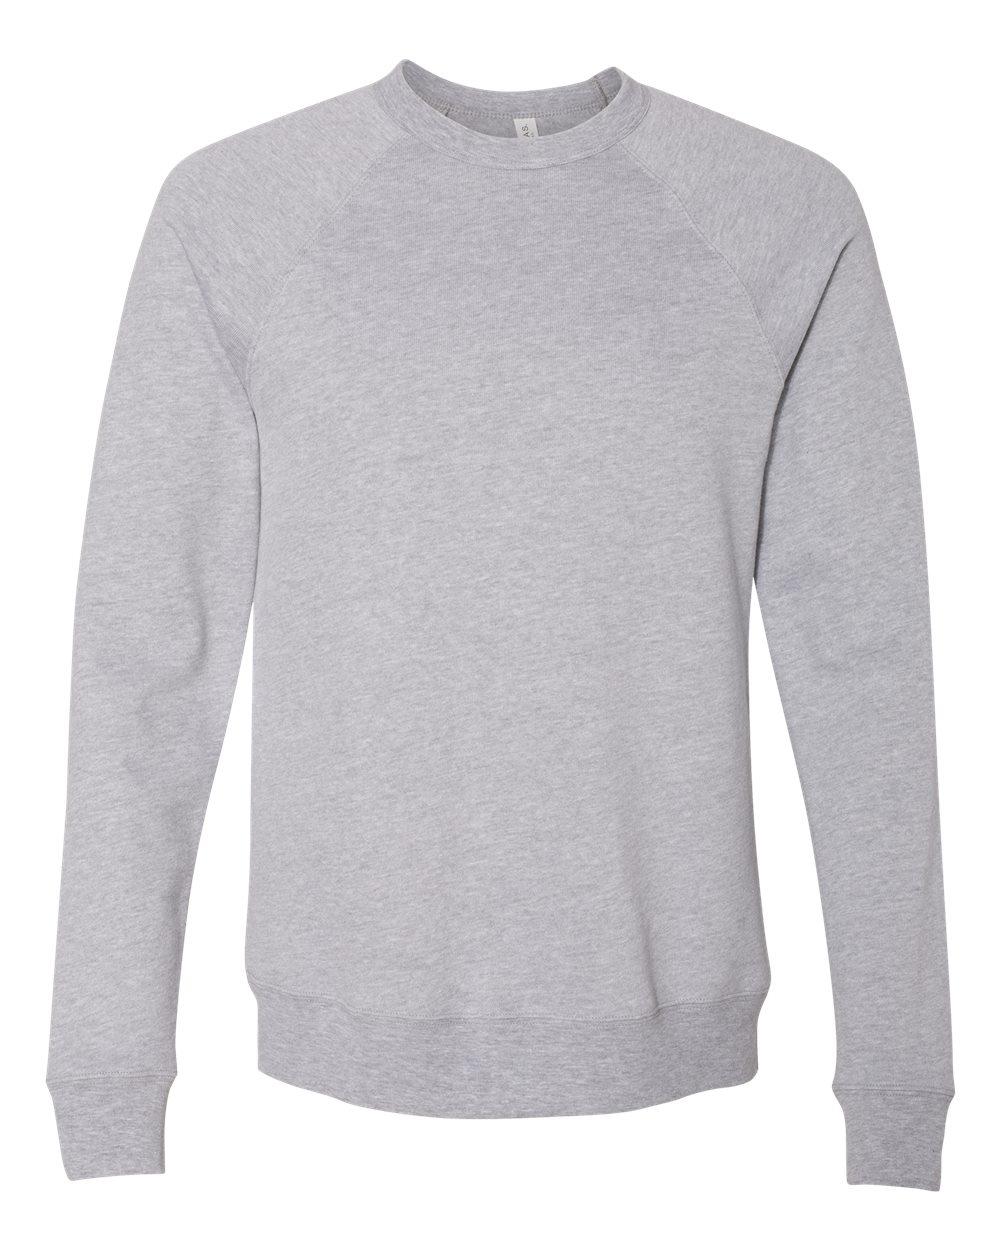 Bella-Canvas-Unisex-Sponge-Fleece-Crewneck-Sweatshirt-Top-Blank-3901-up-to-2XL thumbnail 8